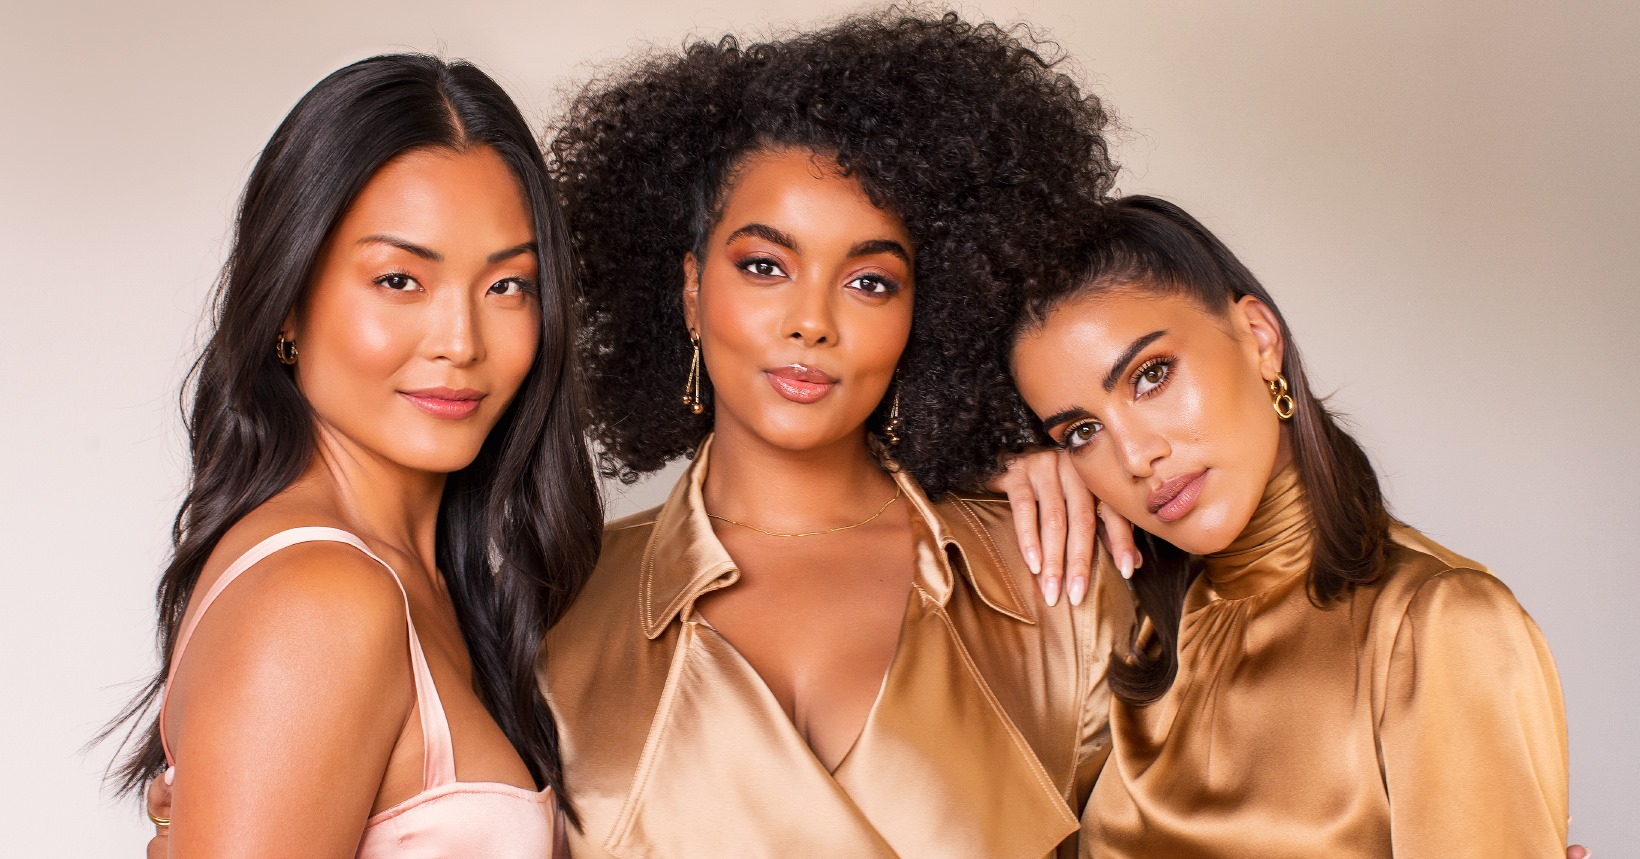 Elaluz – Latino owned beauty brand